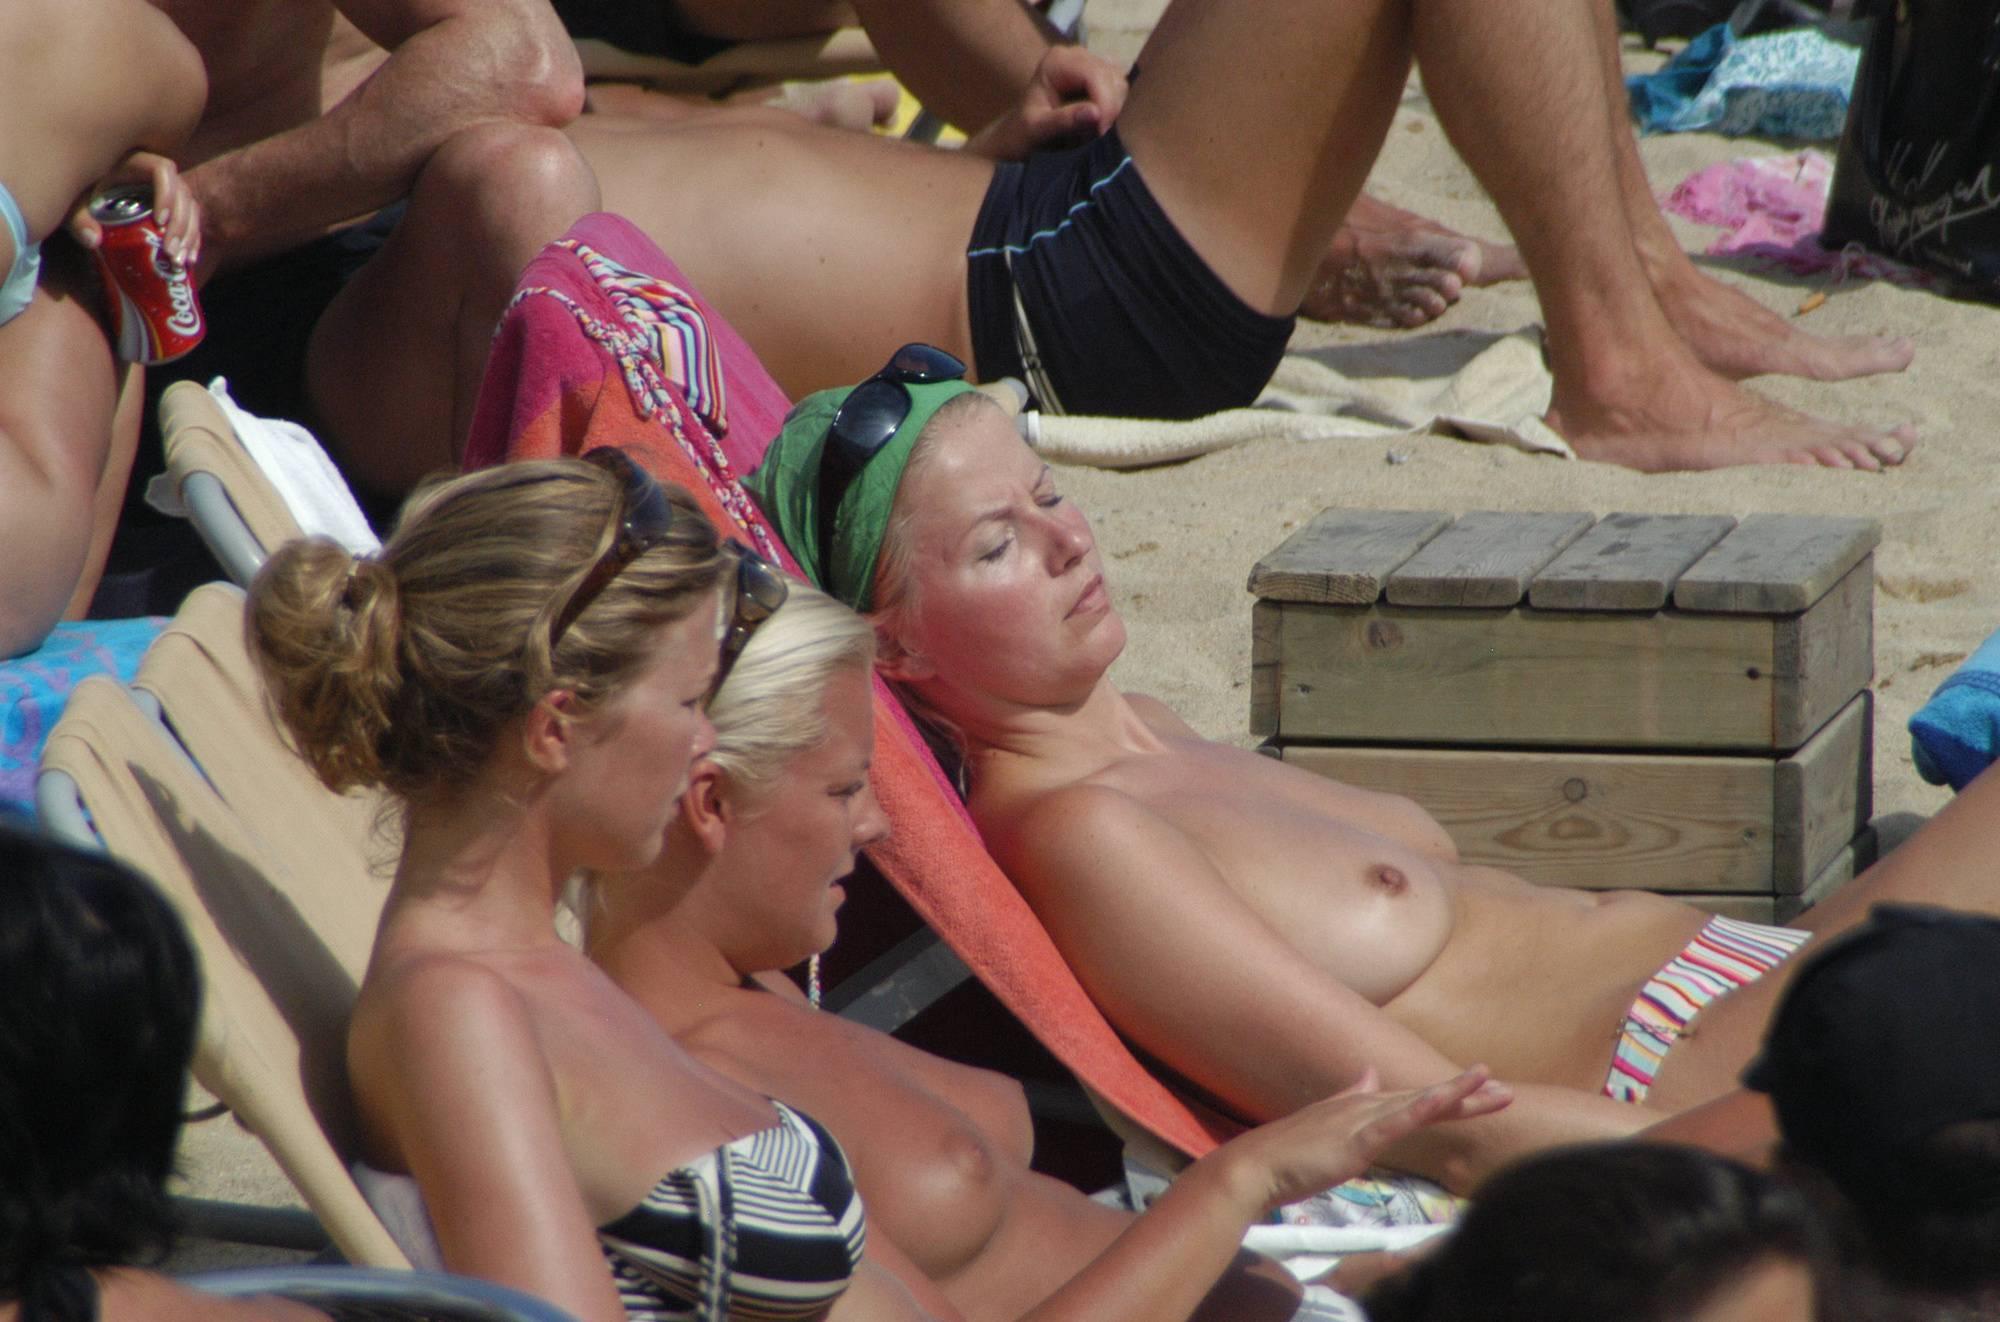 Barcelona Topless Beach - 1